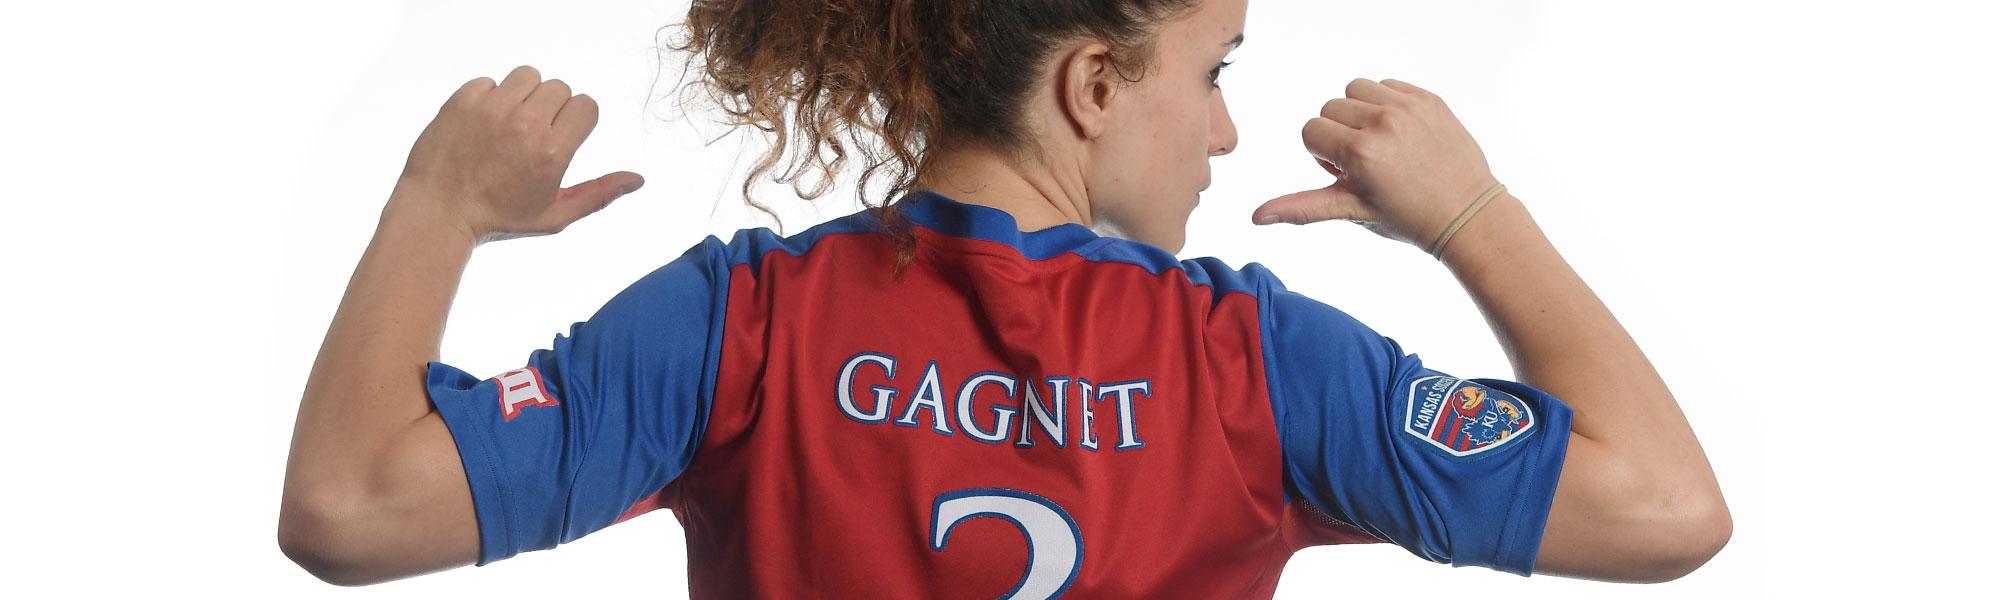 Gagnet